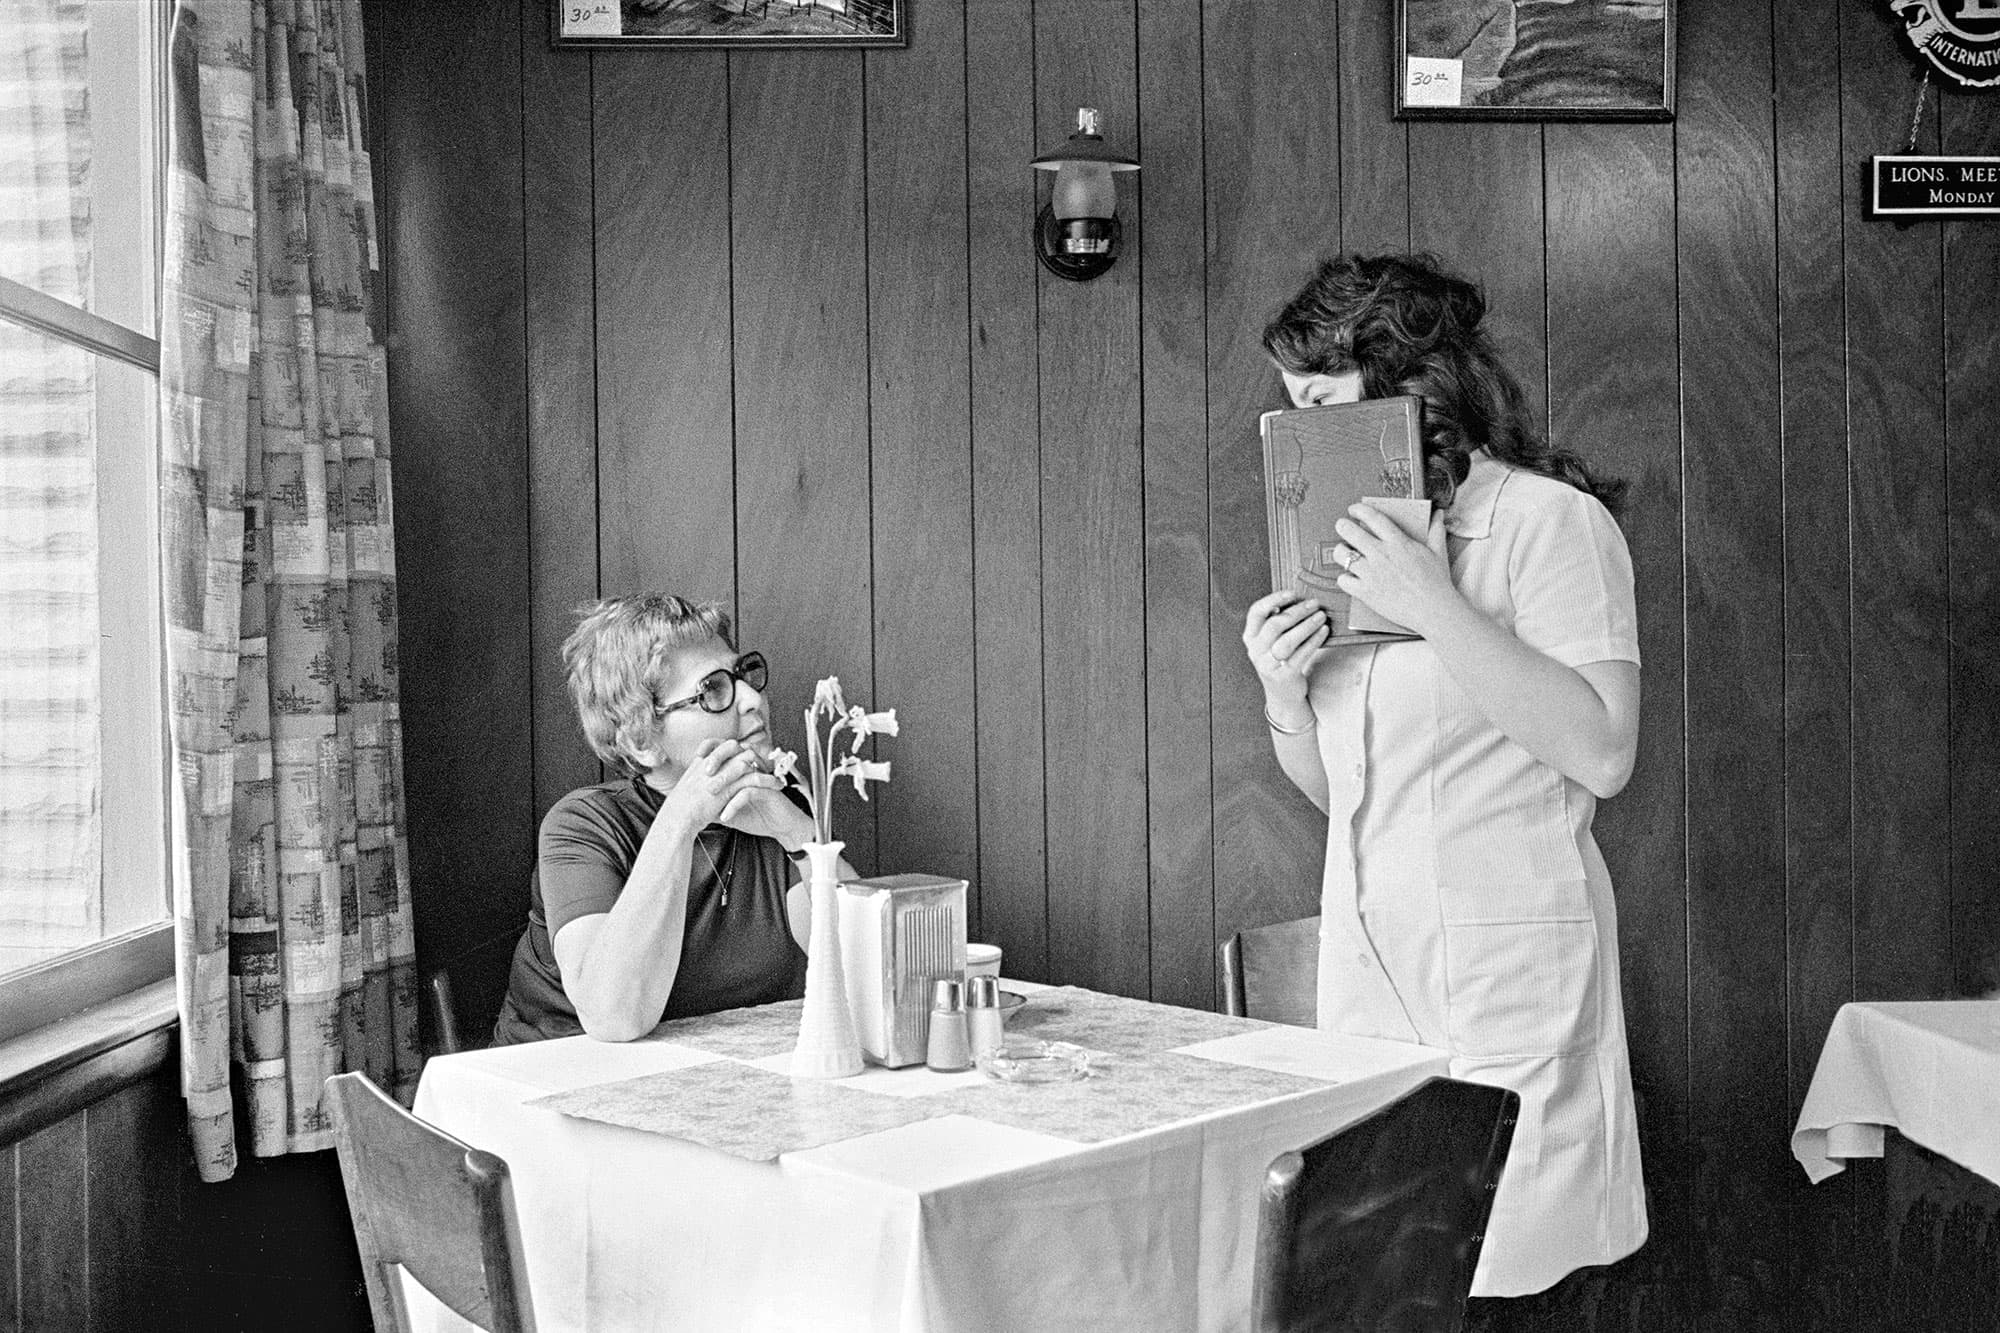 West-Virginia-1978-arthur-lazar